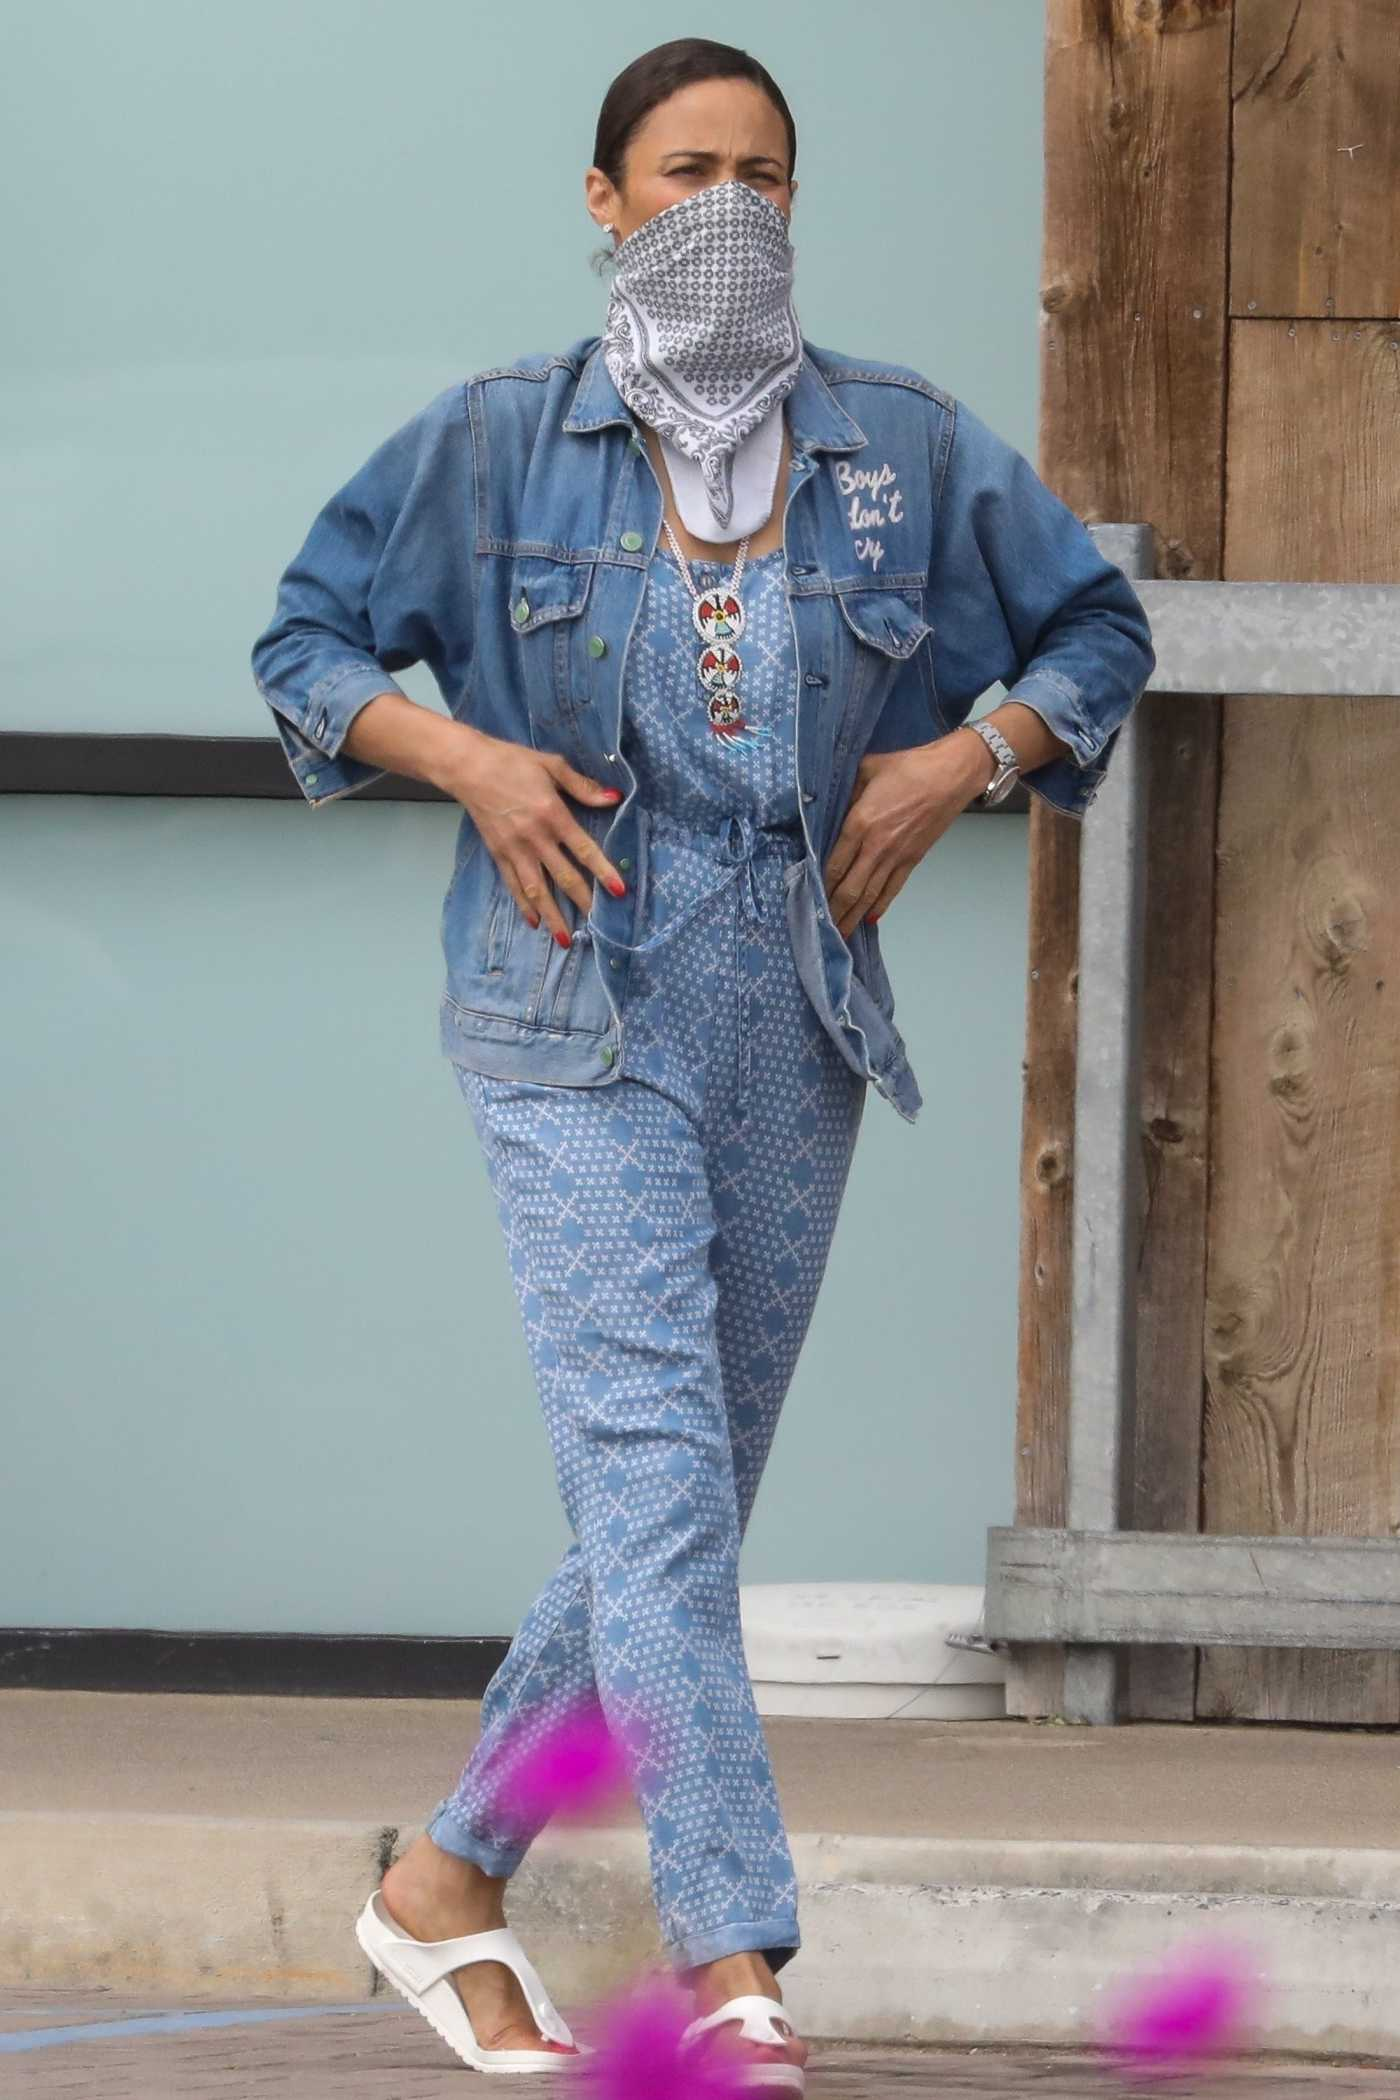 Paula Patton in a Blue Denim Jacket Goes Grocery Shopping in Malibu 04/30/2020